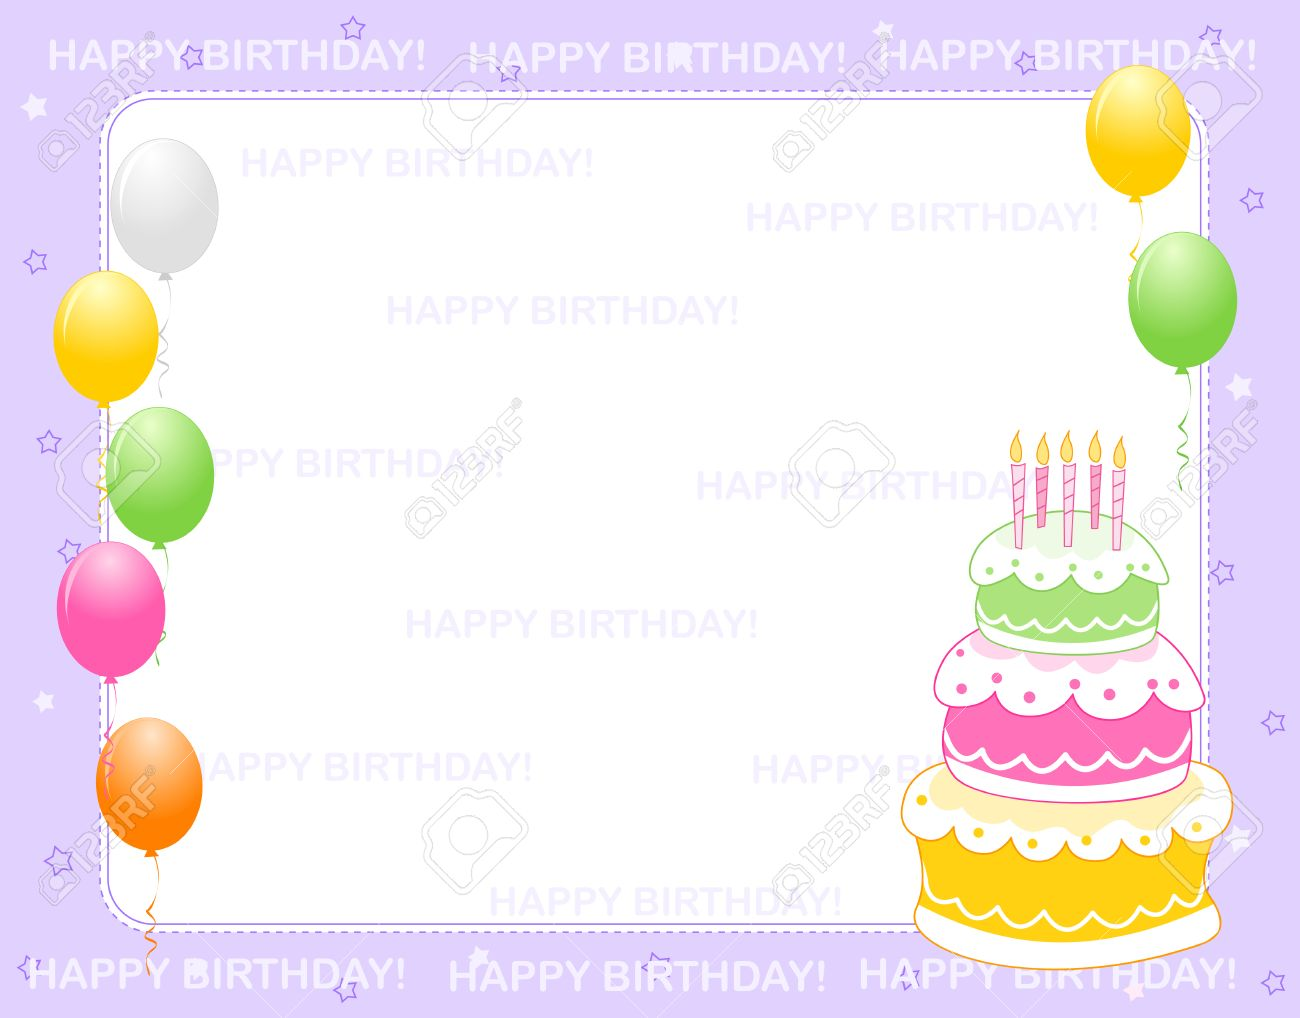 Colorful Birthday Card Invitation Background With Happy Birthday – Happy Birthday Invite